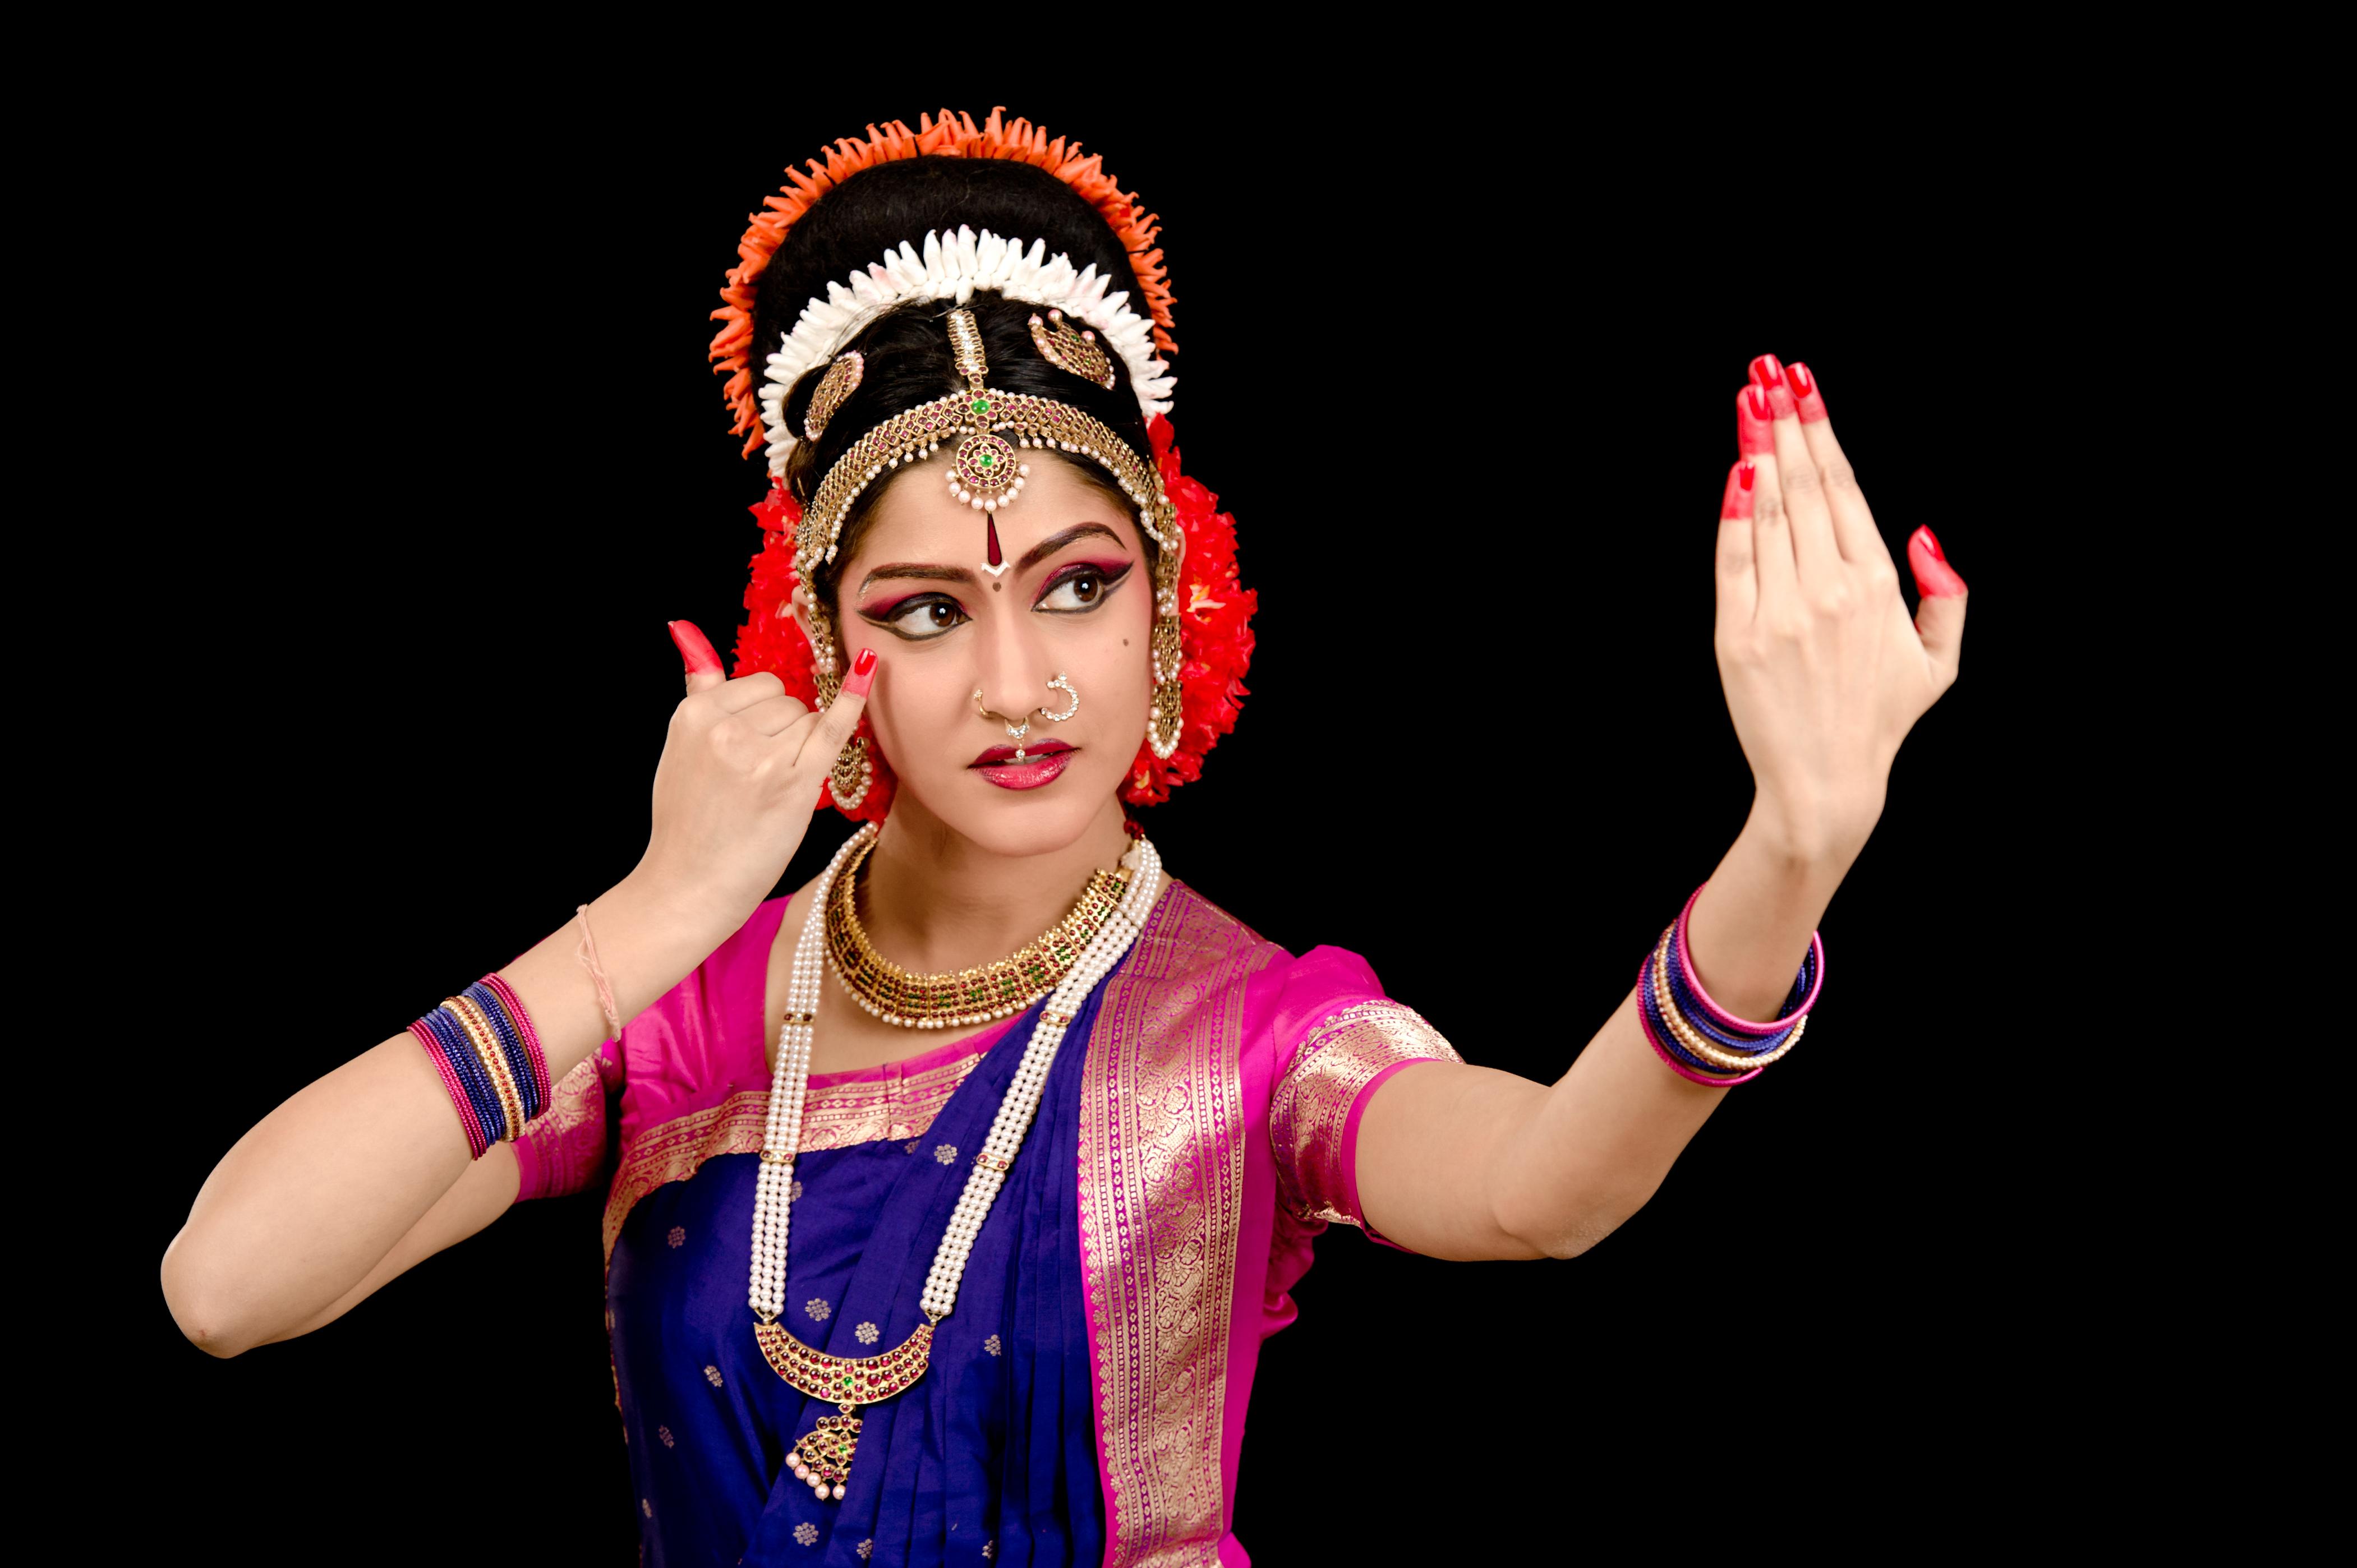 Indian Culture Wallpaper Hd Aneesha Amp Anuja From Kuchipudi Dance Academy Vemula